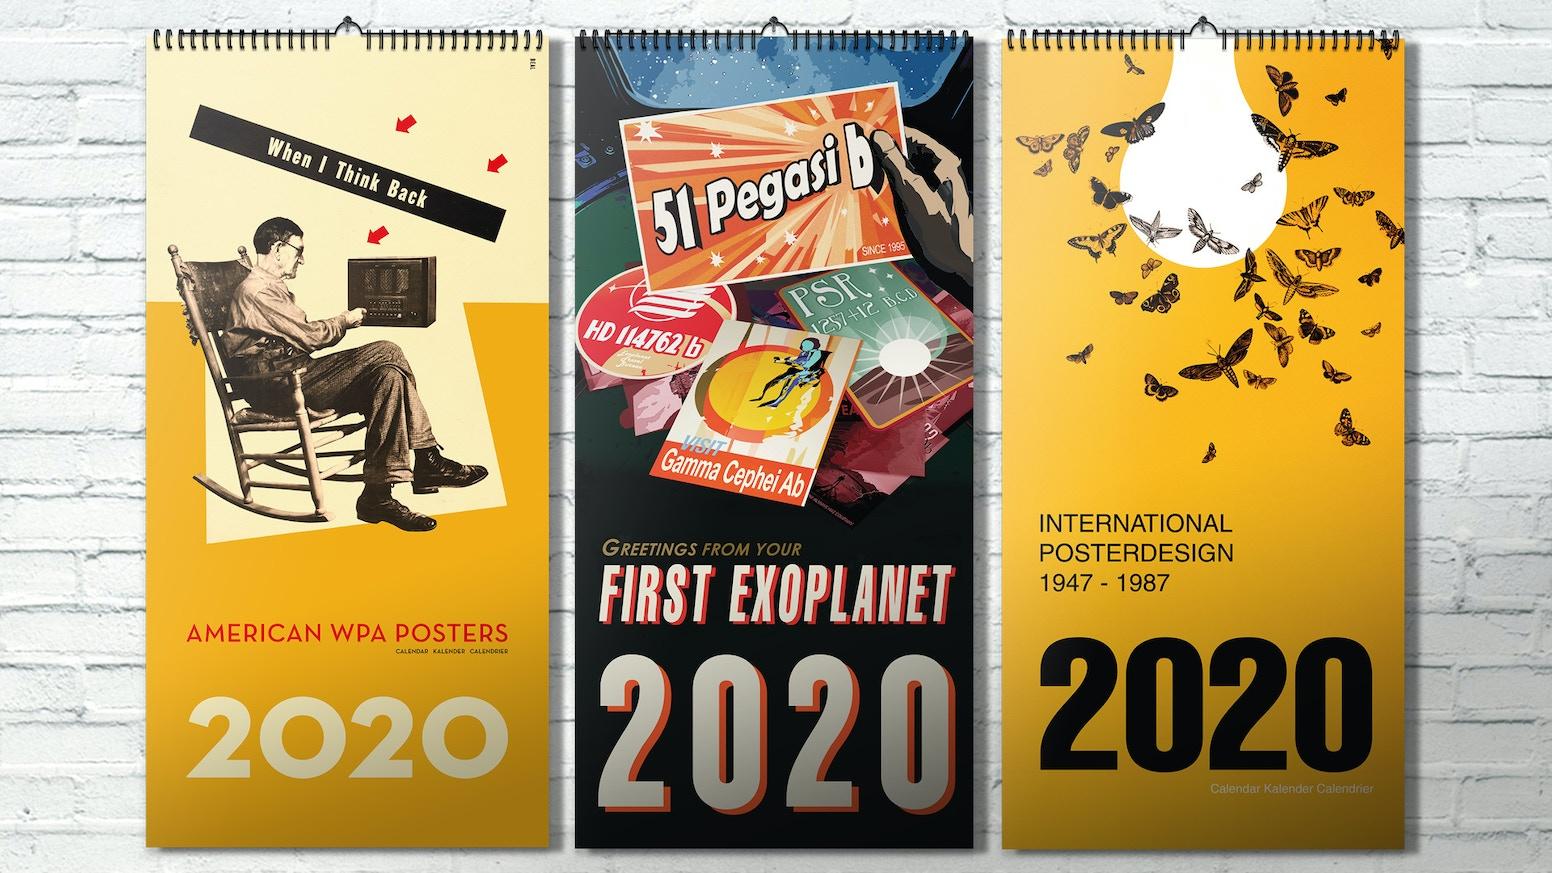 2020.  THE NASA EXOPLANET CALENDAR +++ POSTERDESIGN CALENDAR WITH SAUL BASS, ROBERT INDIANA AND OTHERS +++ WPA POSTER CALENDAR +++